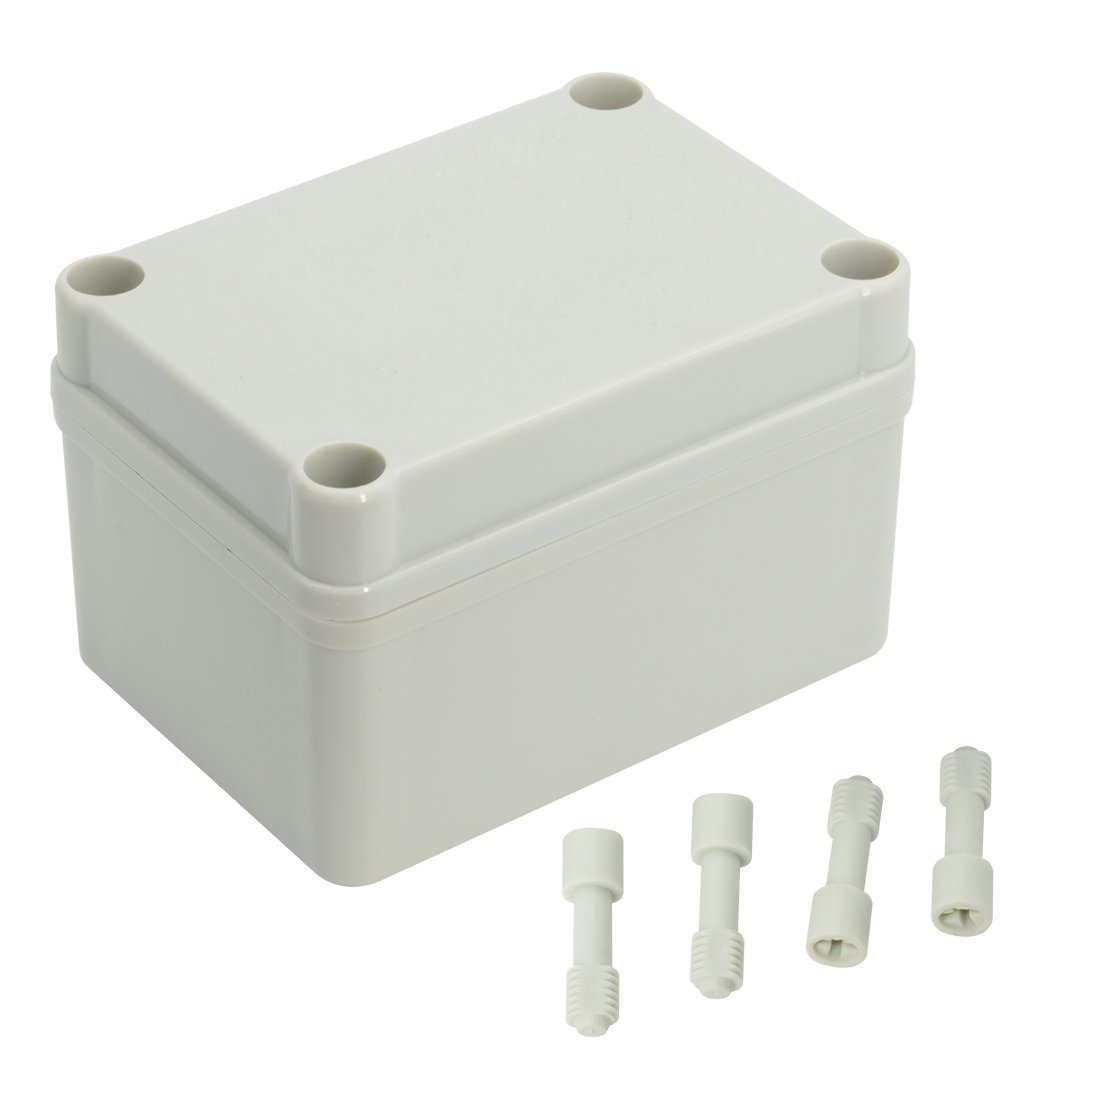 LeMotech Waterproof Dustproof IP67 Junction Box DIY Case Enclosure Gray 7.9' x 7.9' x 3.7'(200mm x 200mm x 95mm)